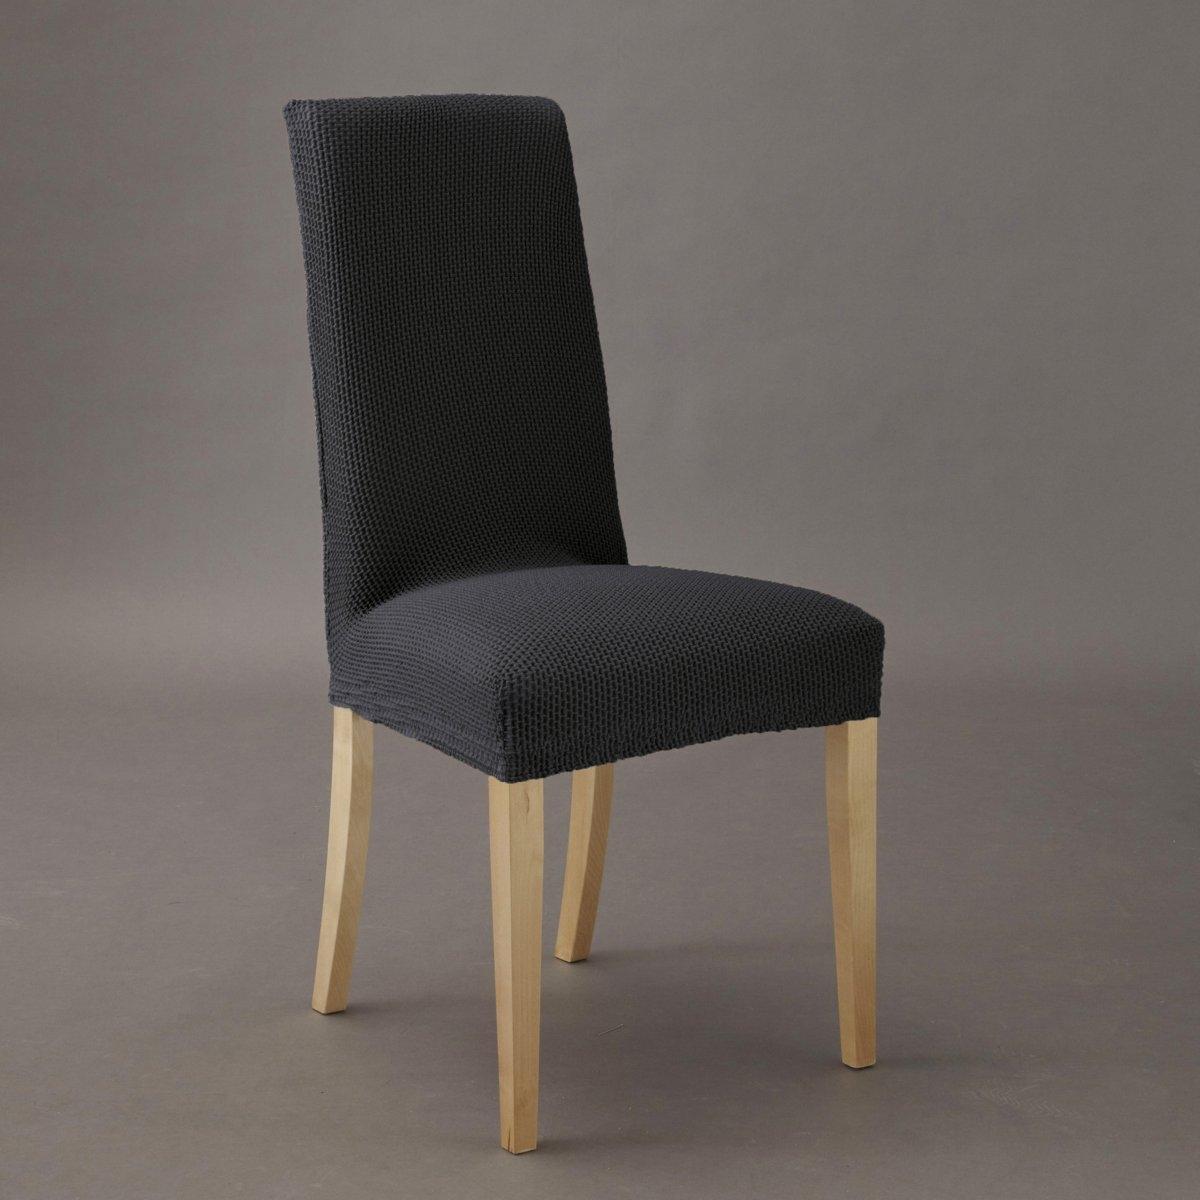 Чехол для стула  26534 от LaRedoute